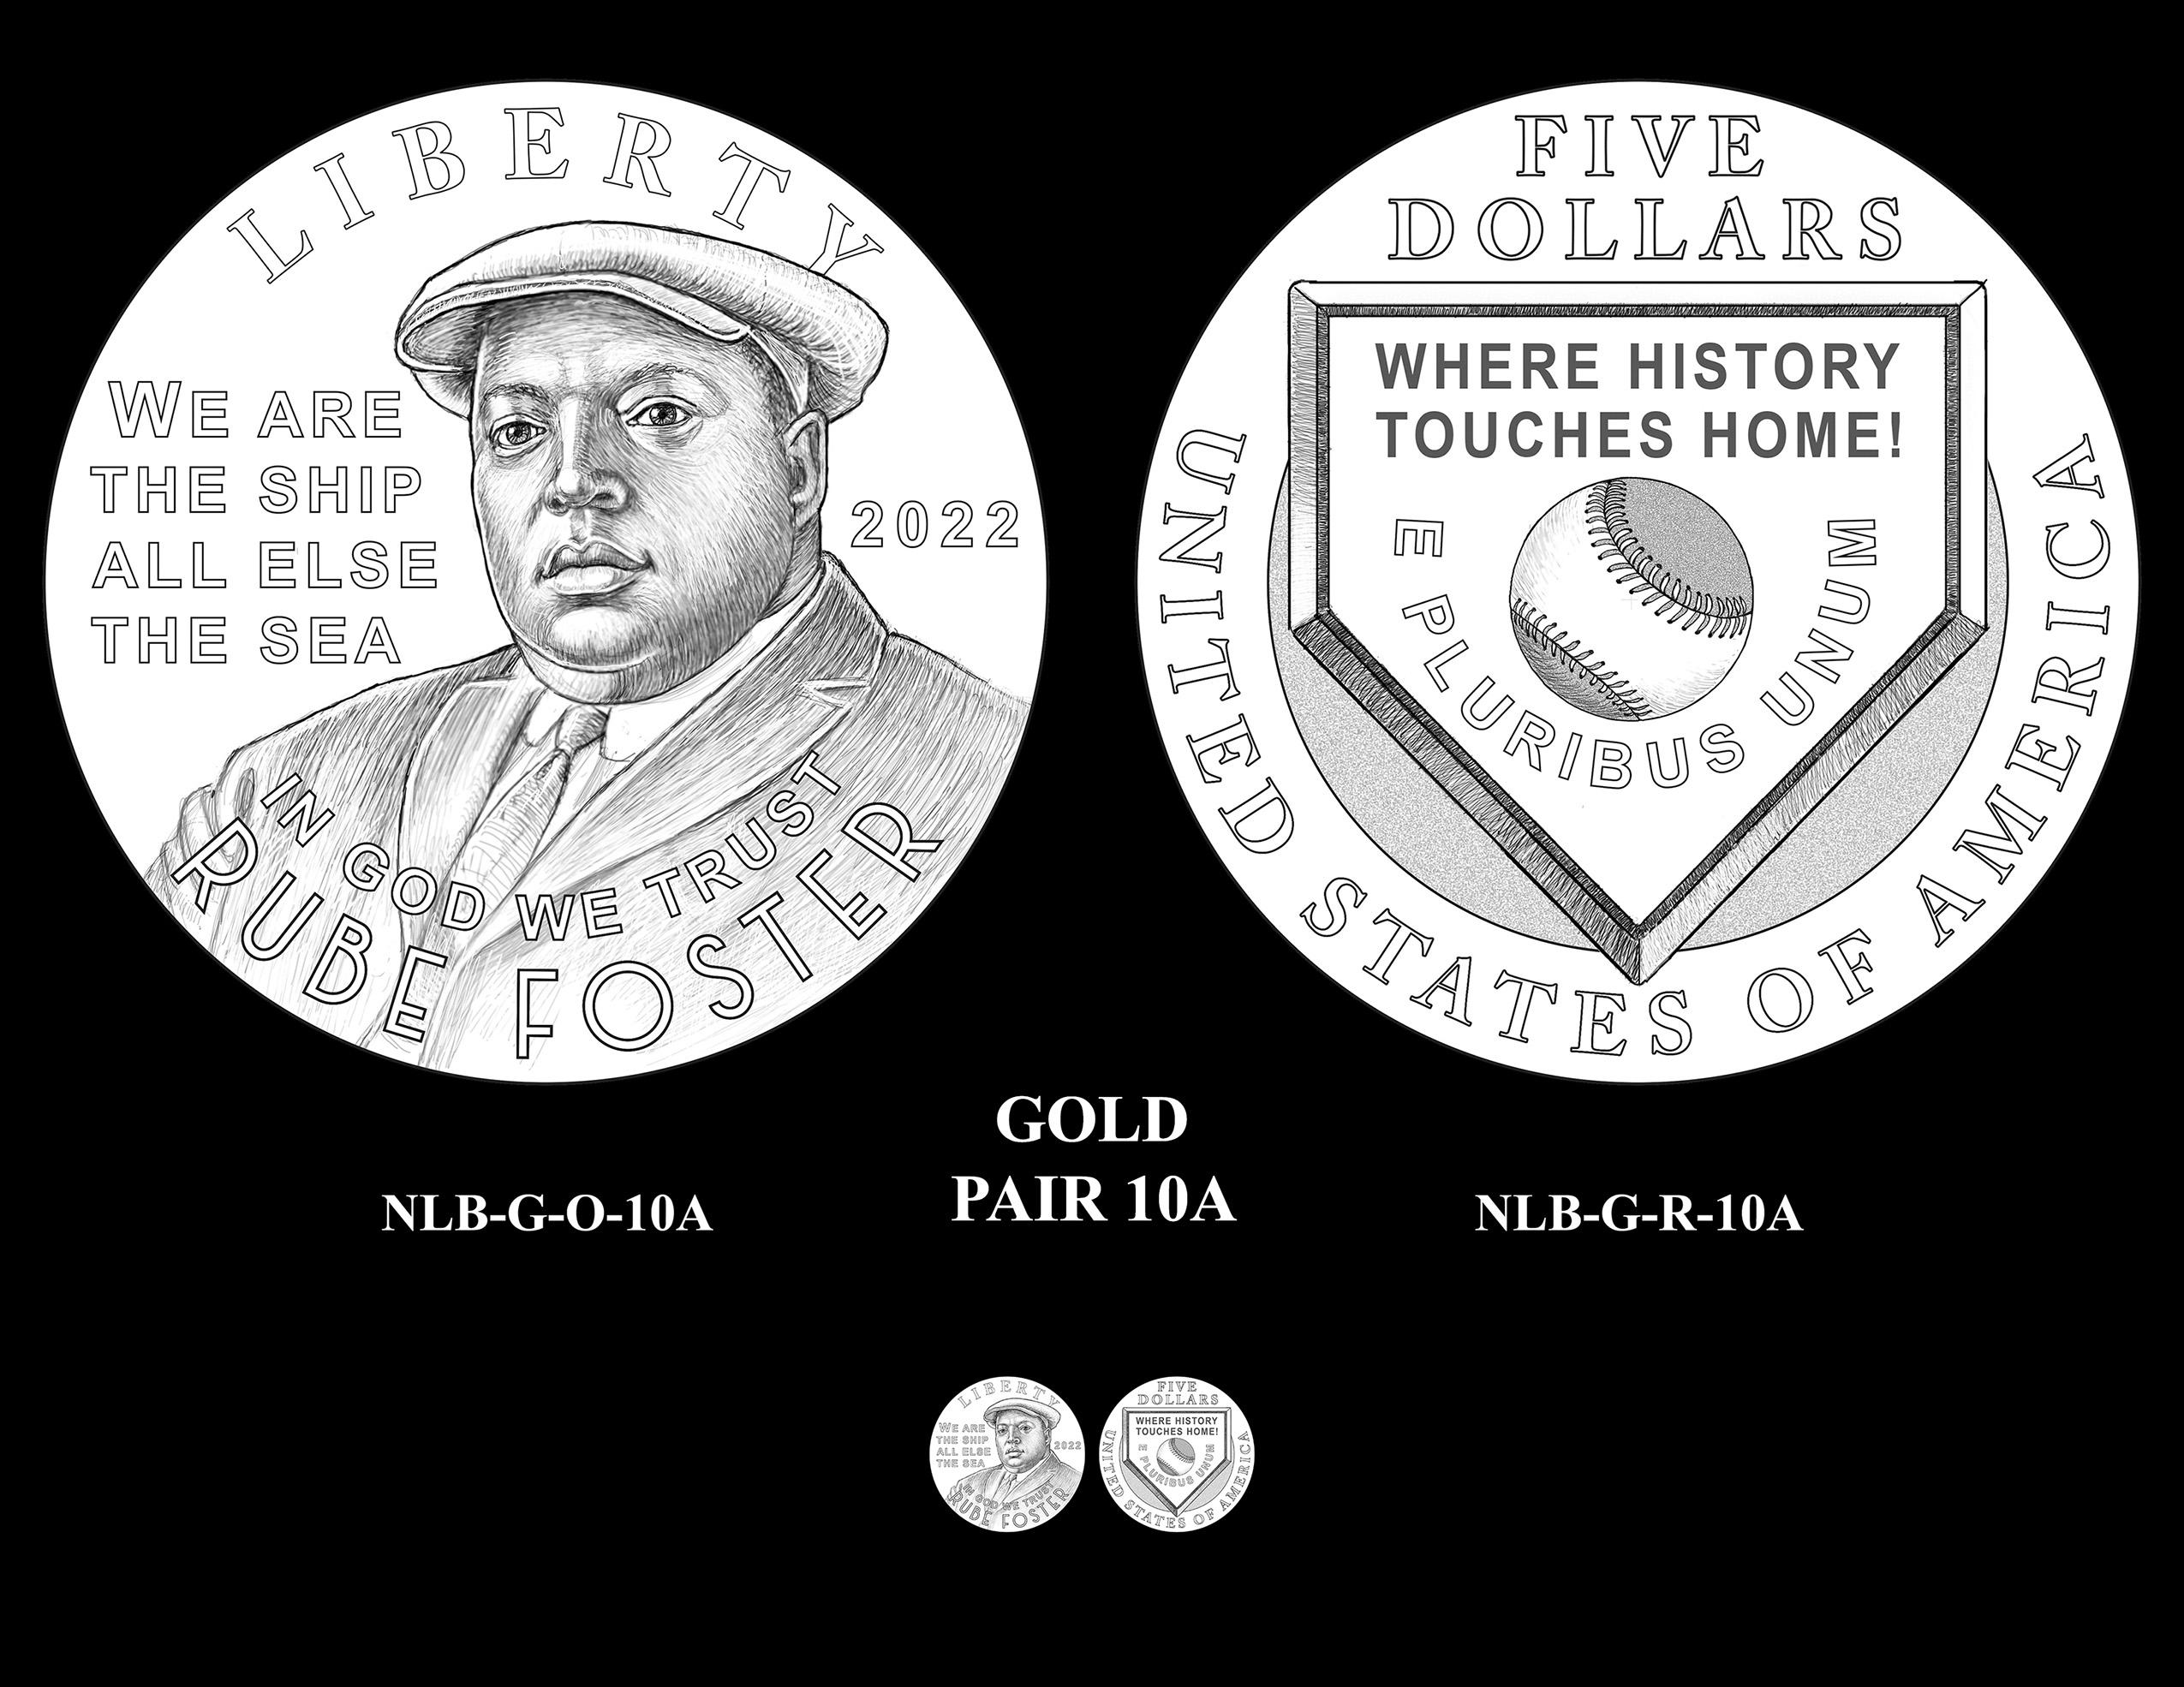 Gold Pair 10A -- Negro Leagues Baseball Commemorative Coin Program